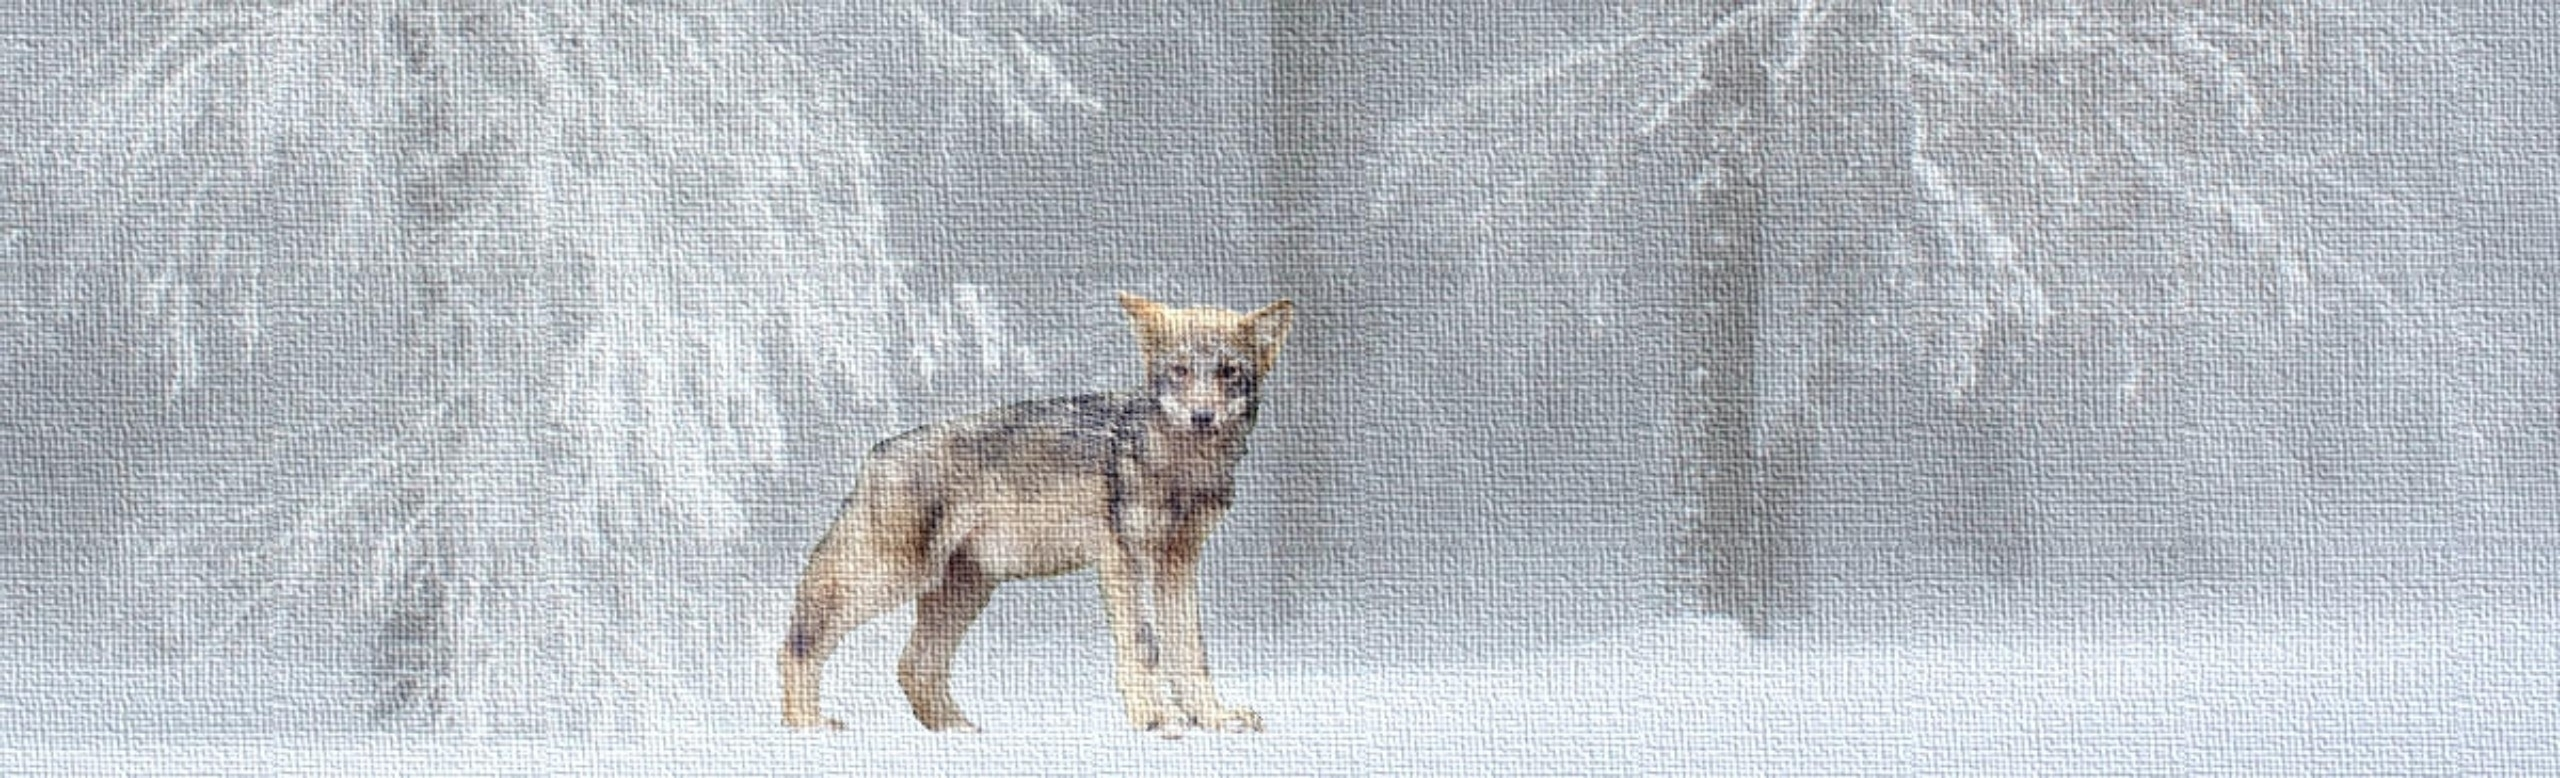 Peuple Loup (@peupleloup) Cover Image